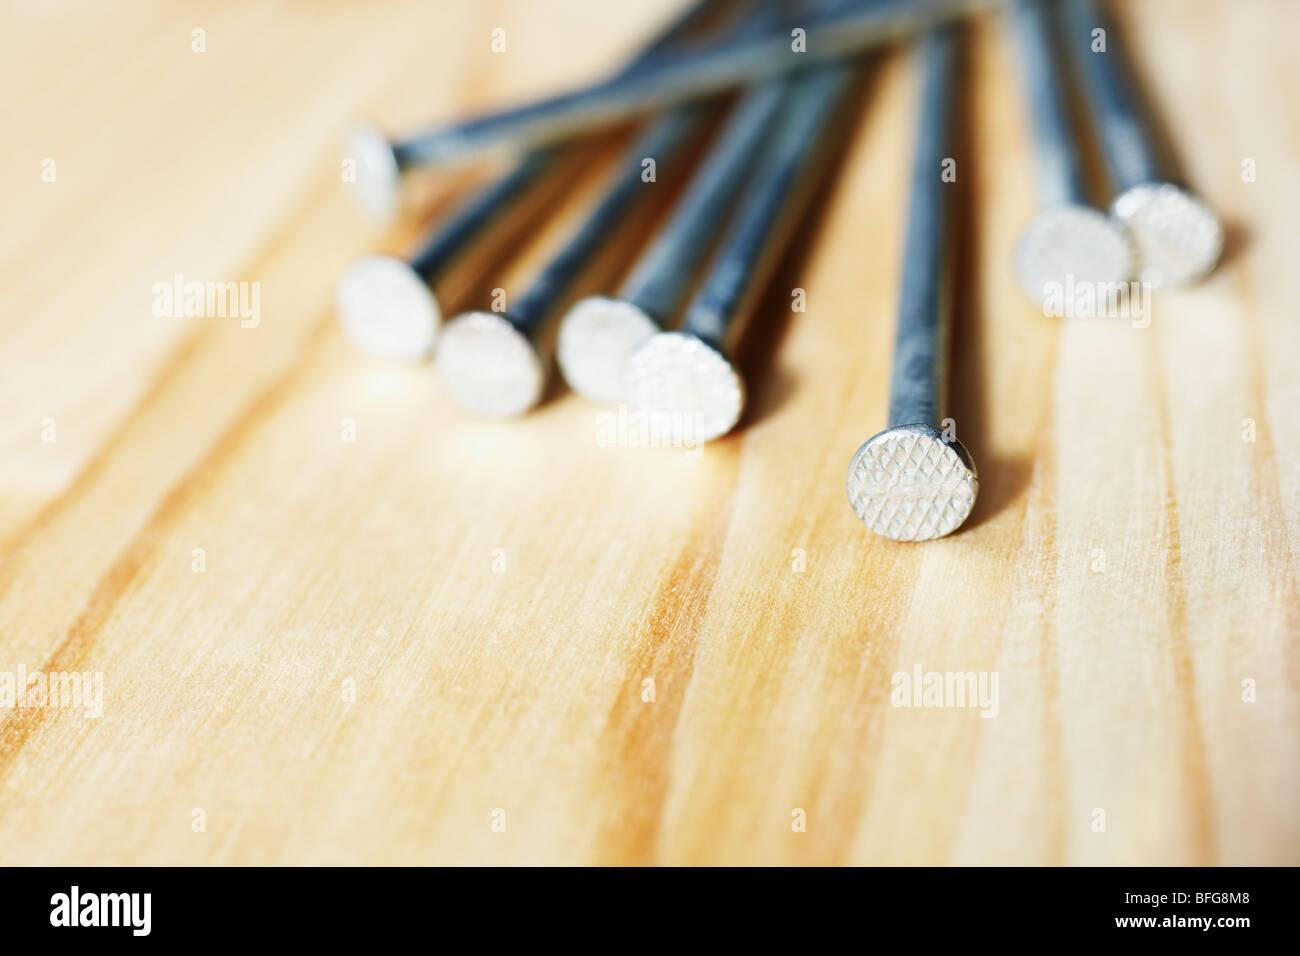 nails - Stock Image